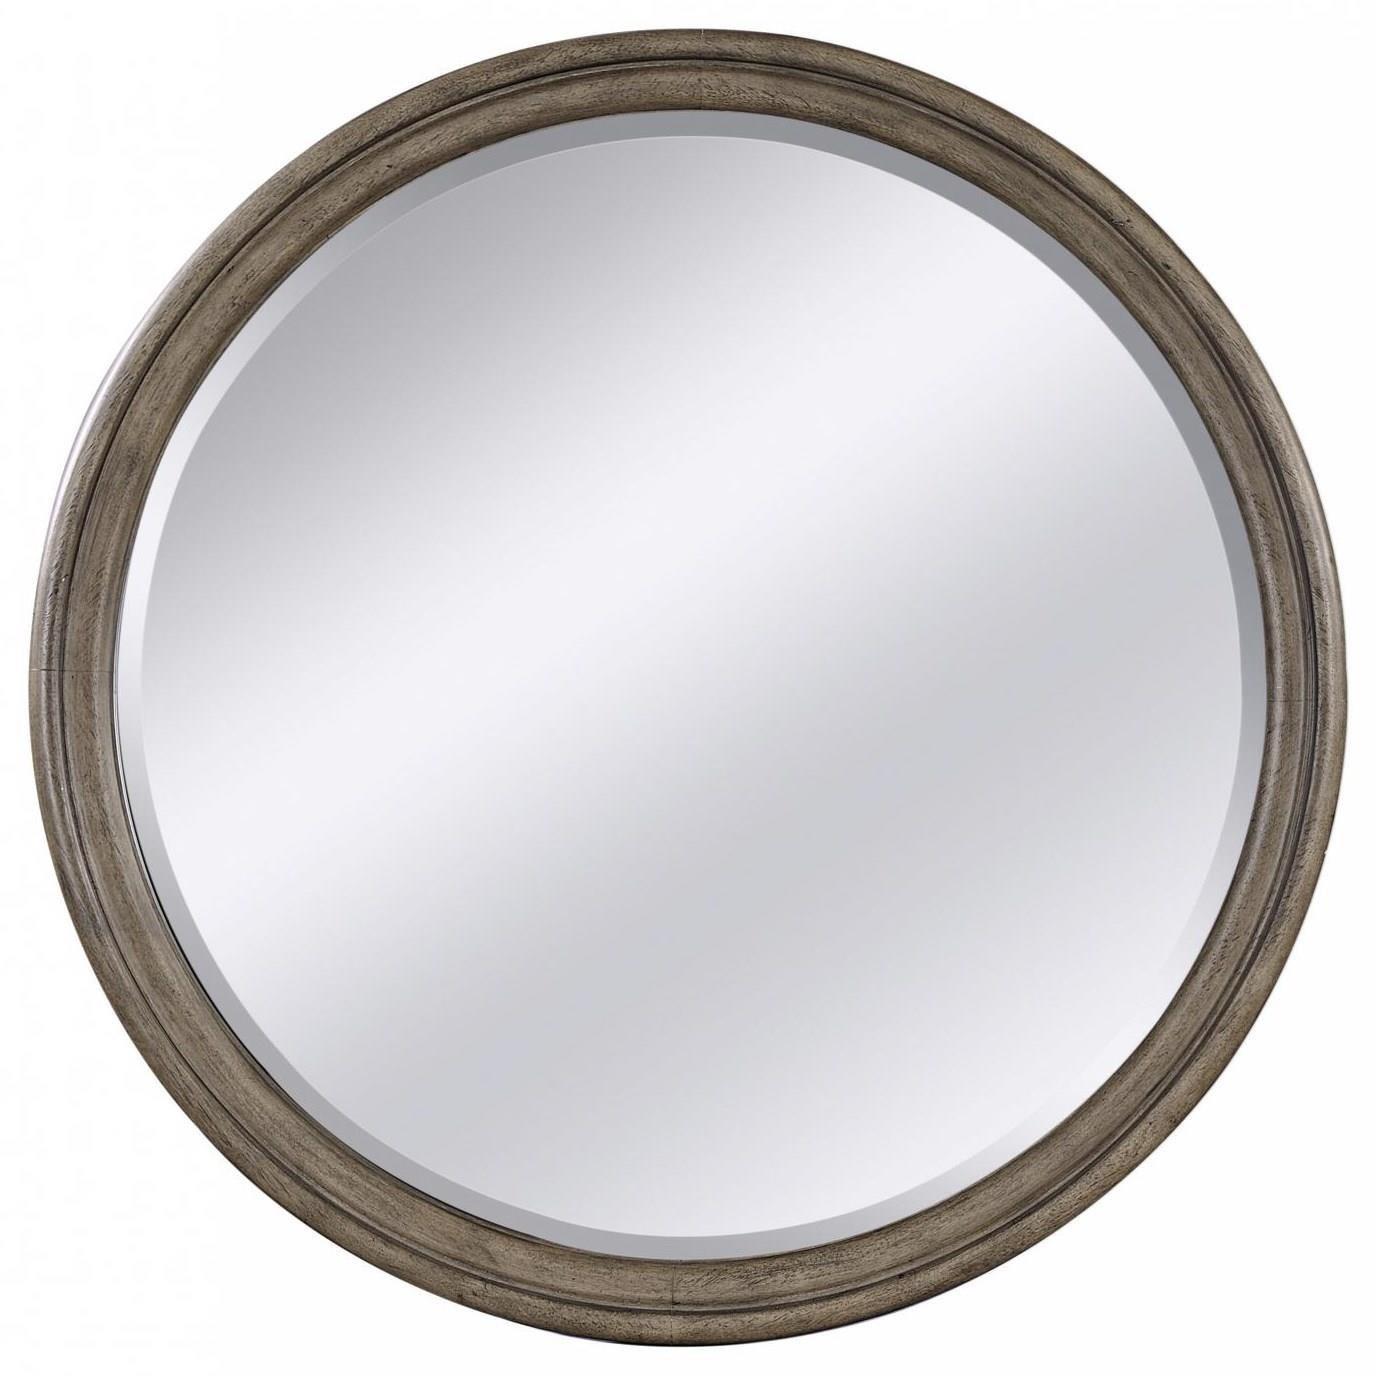 Strasbourg Round Mirror by Aspenhome at Walker's Furniture